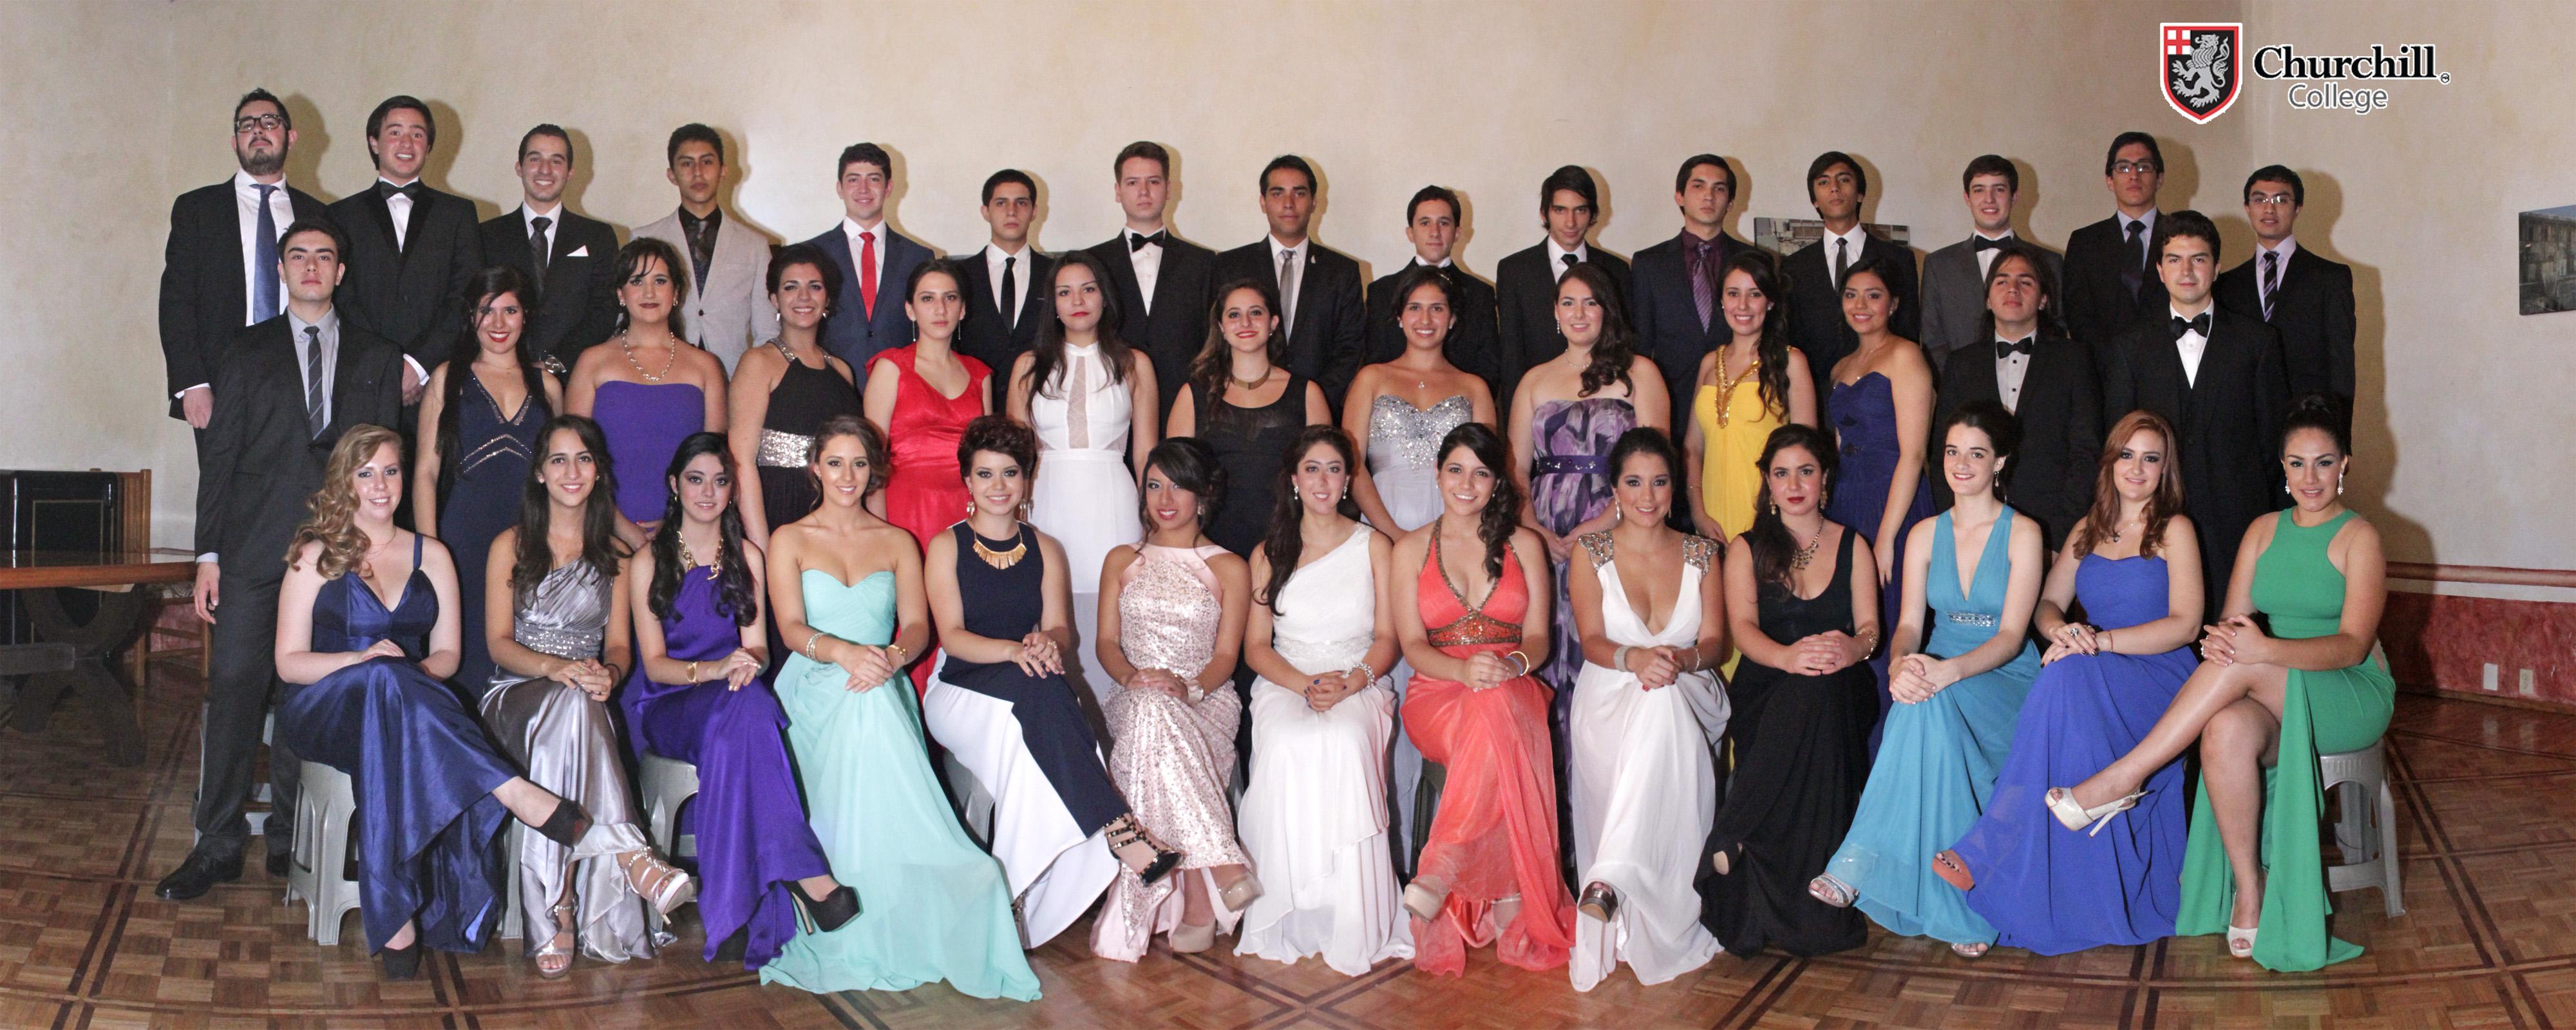 Graduaciones Churchill College @GraduacionMX #GraduacionChurchillCollege Casa del Corregidor 2014